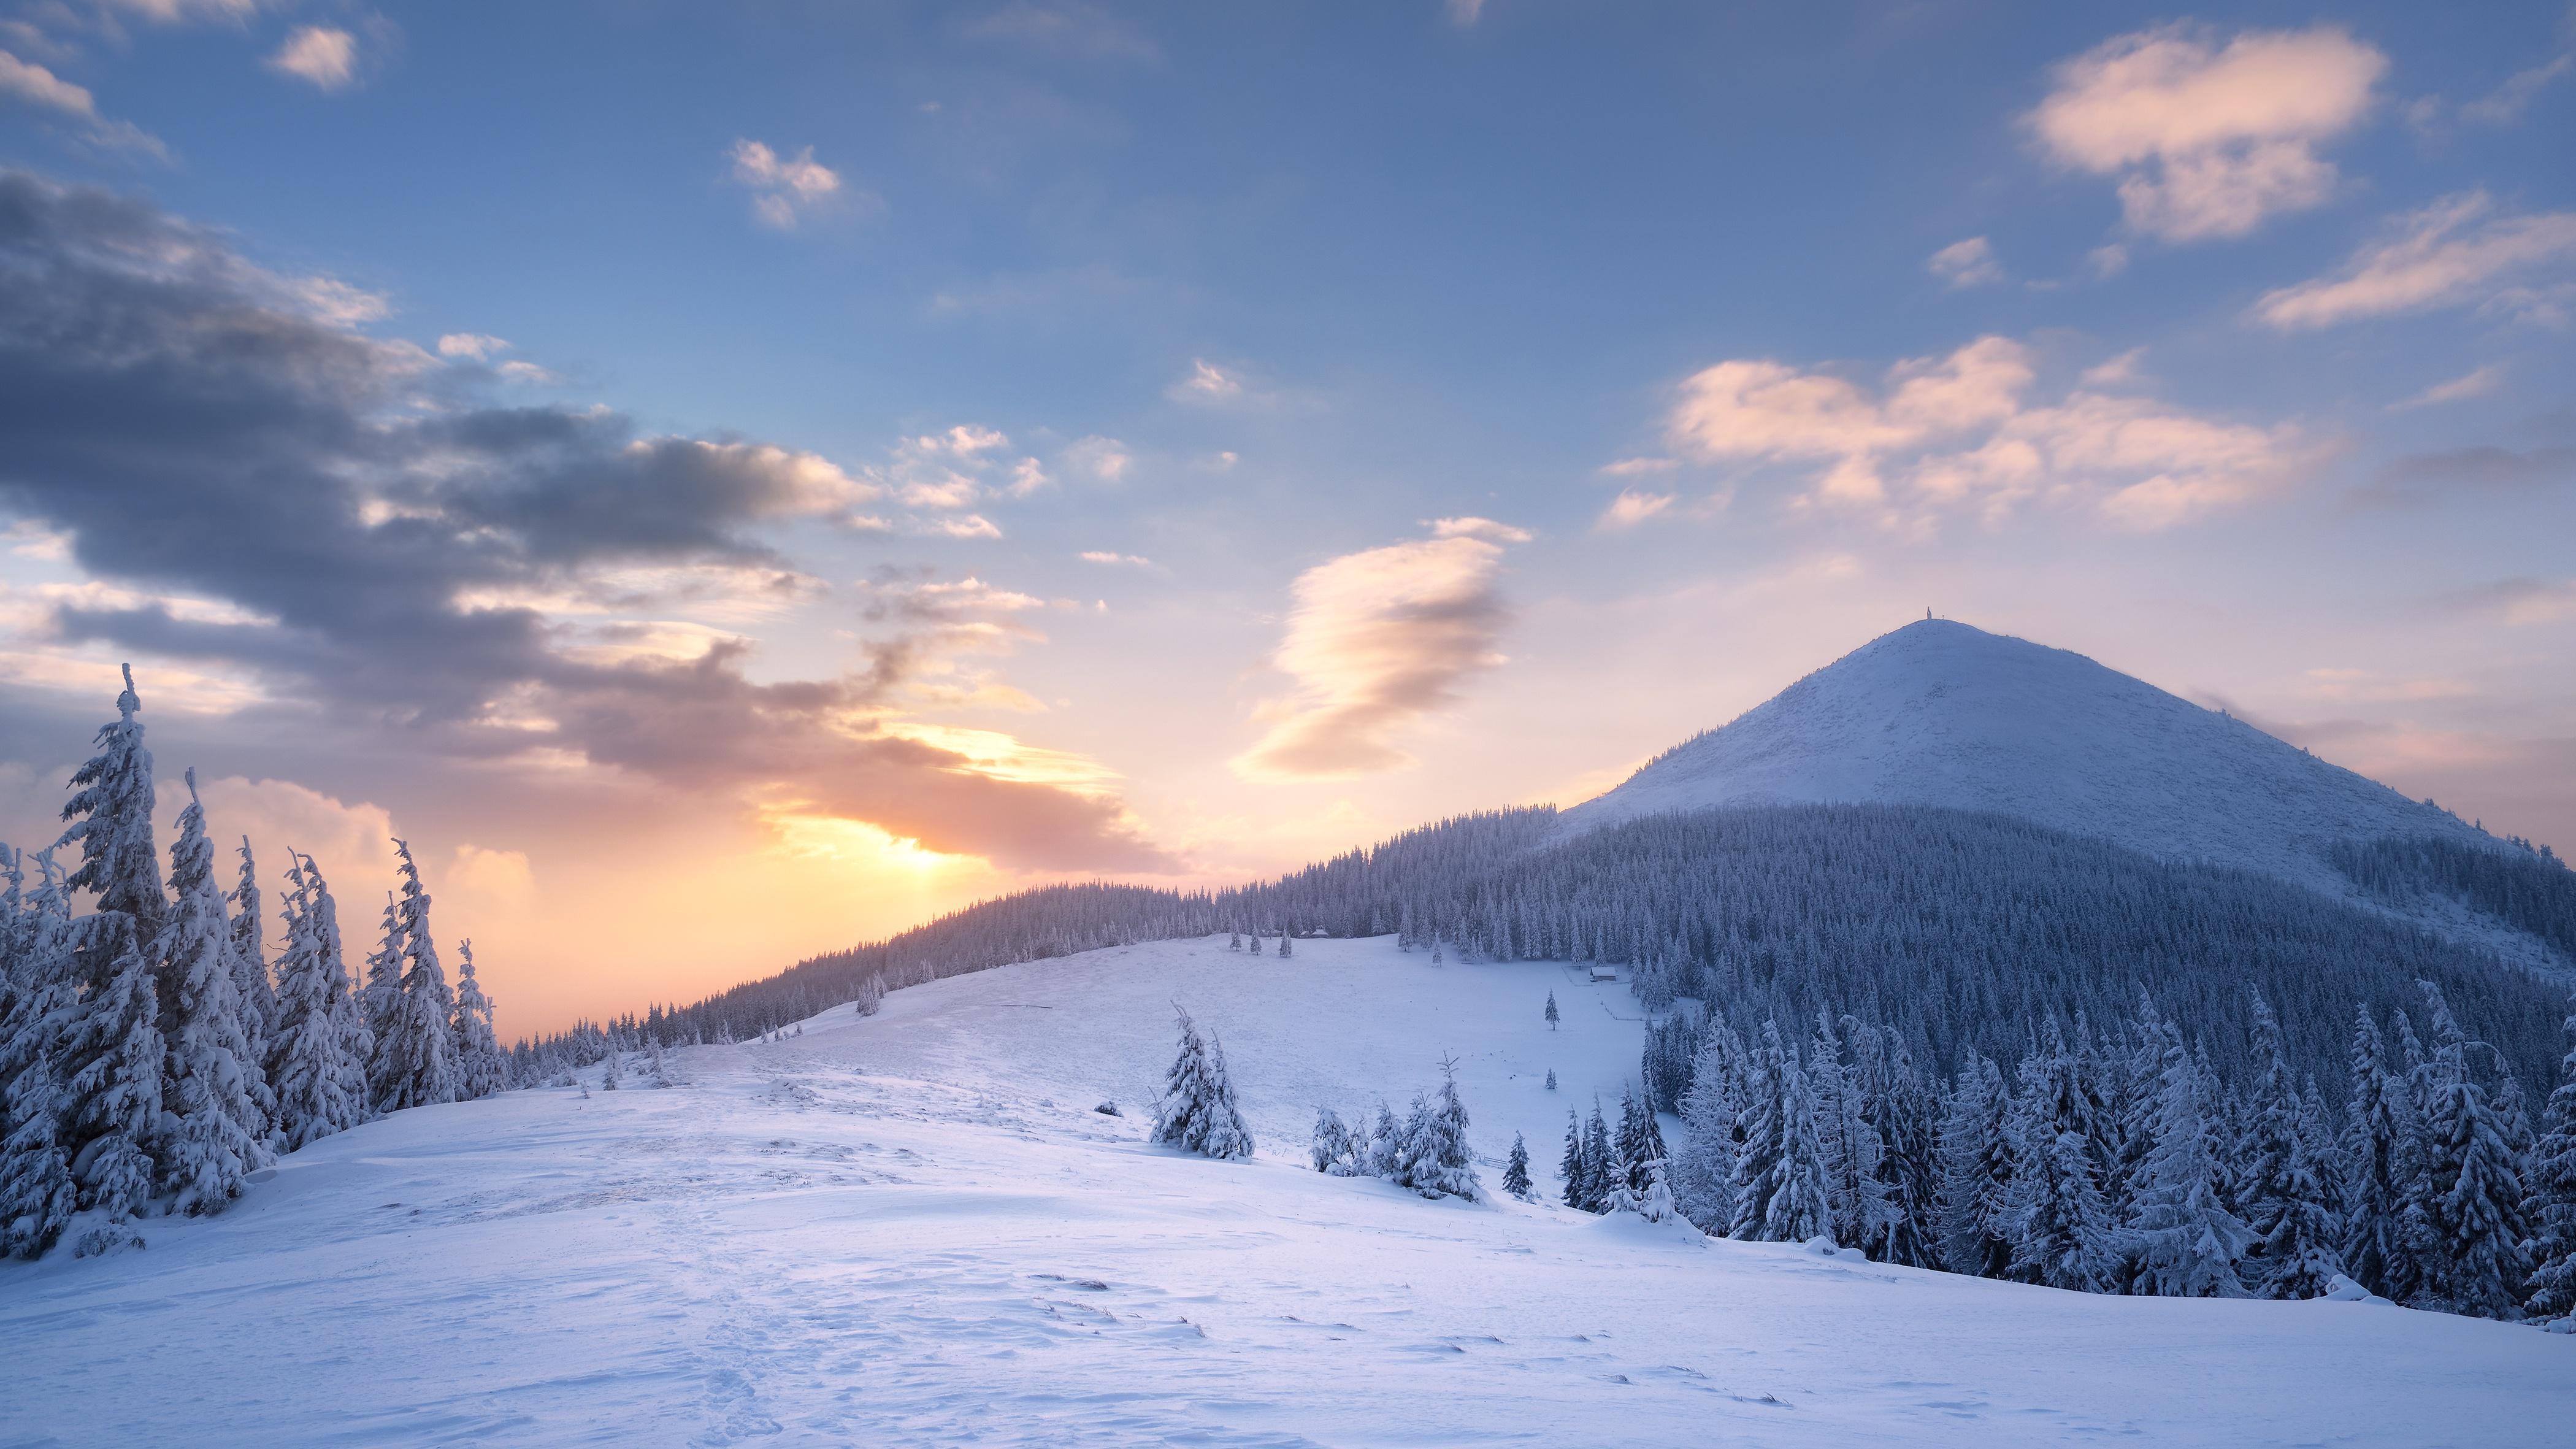 закат склон sunset the slope  № 1569354 бесплатно